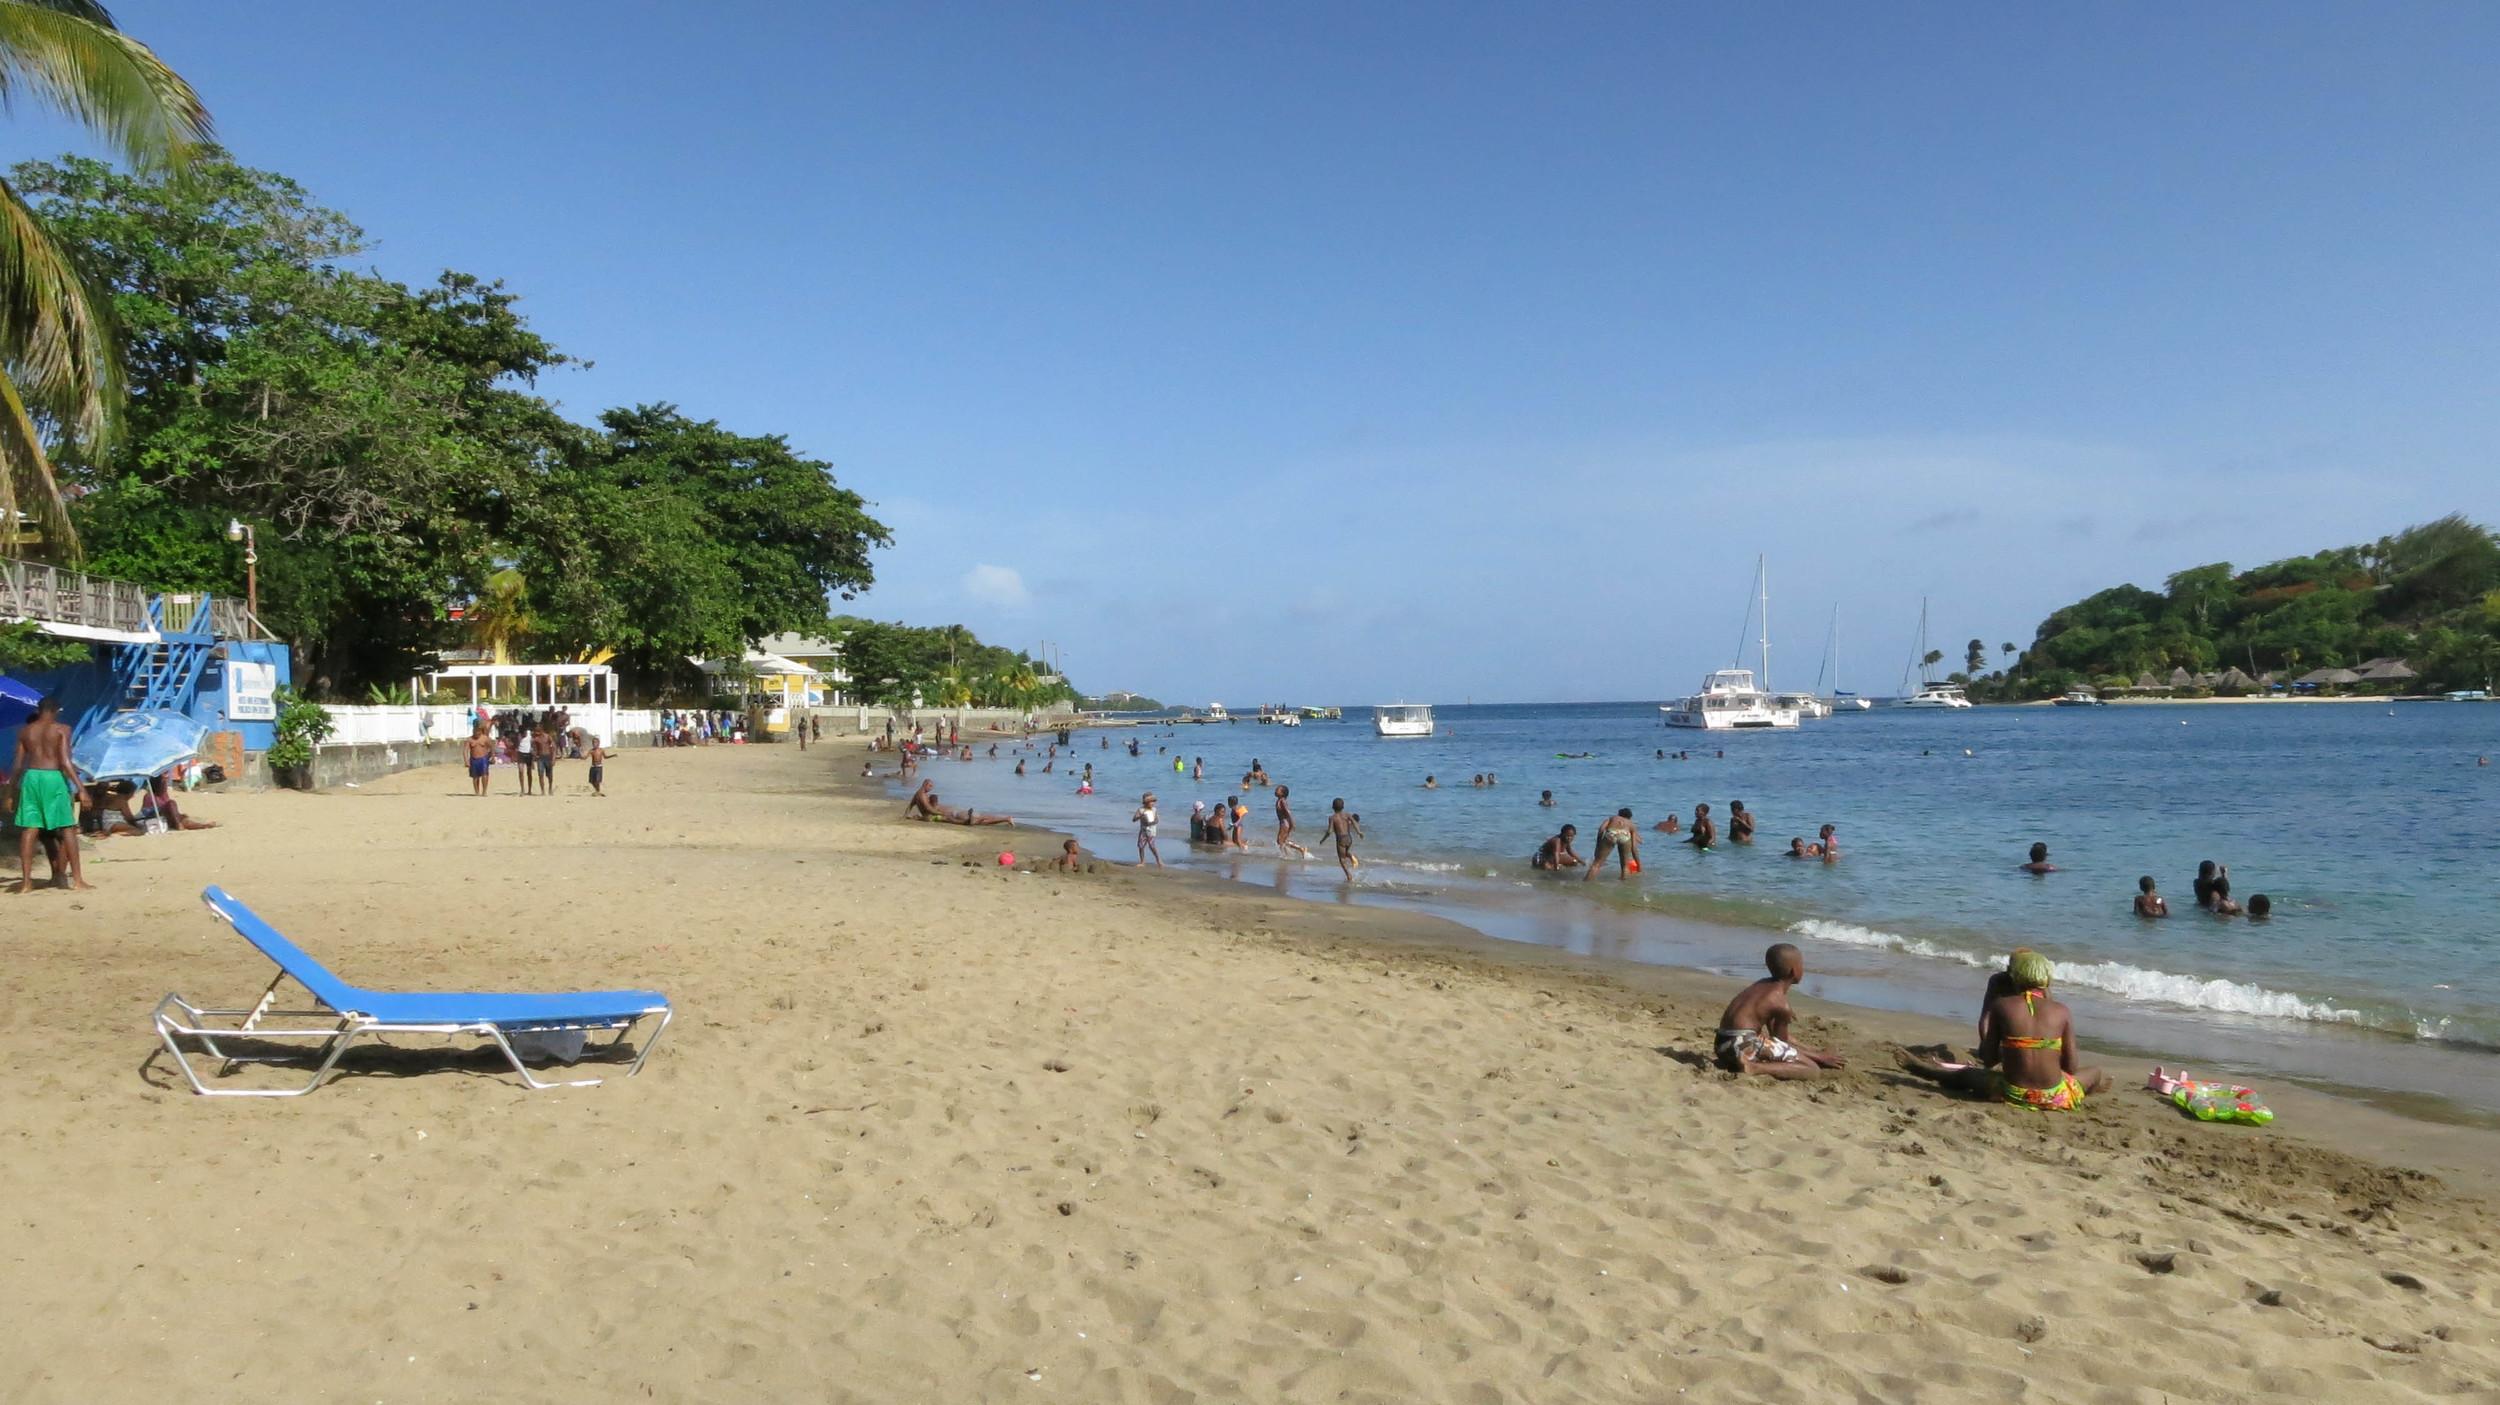 Beachcomber Beach